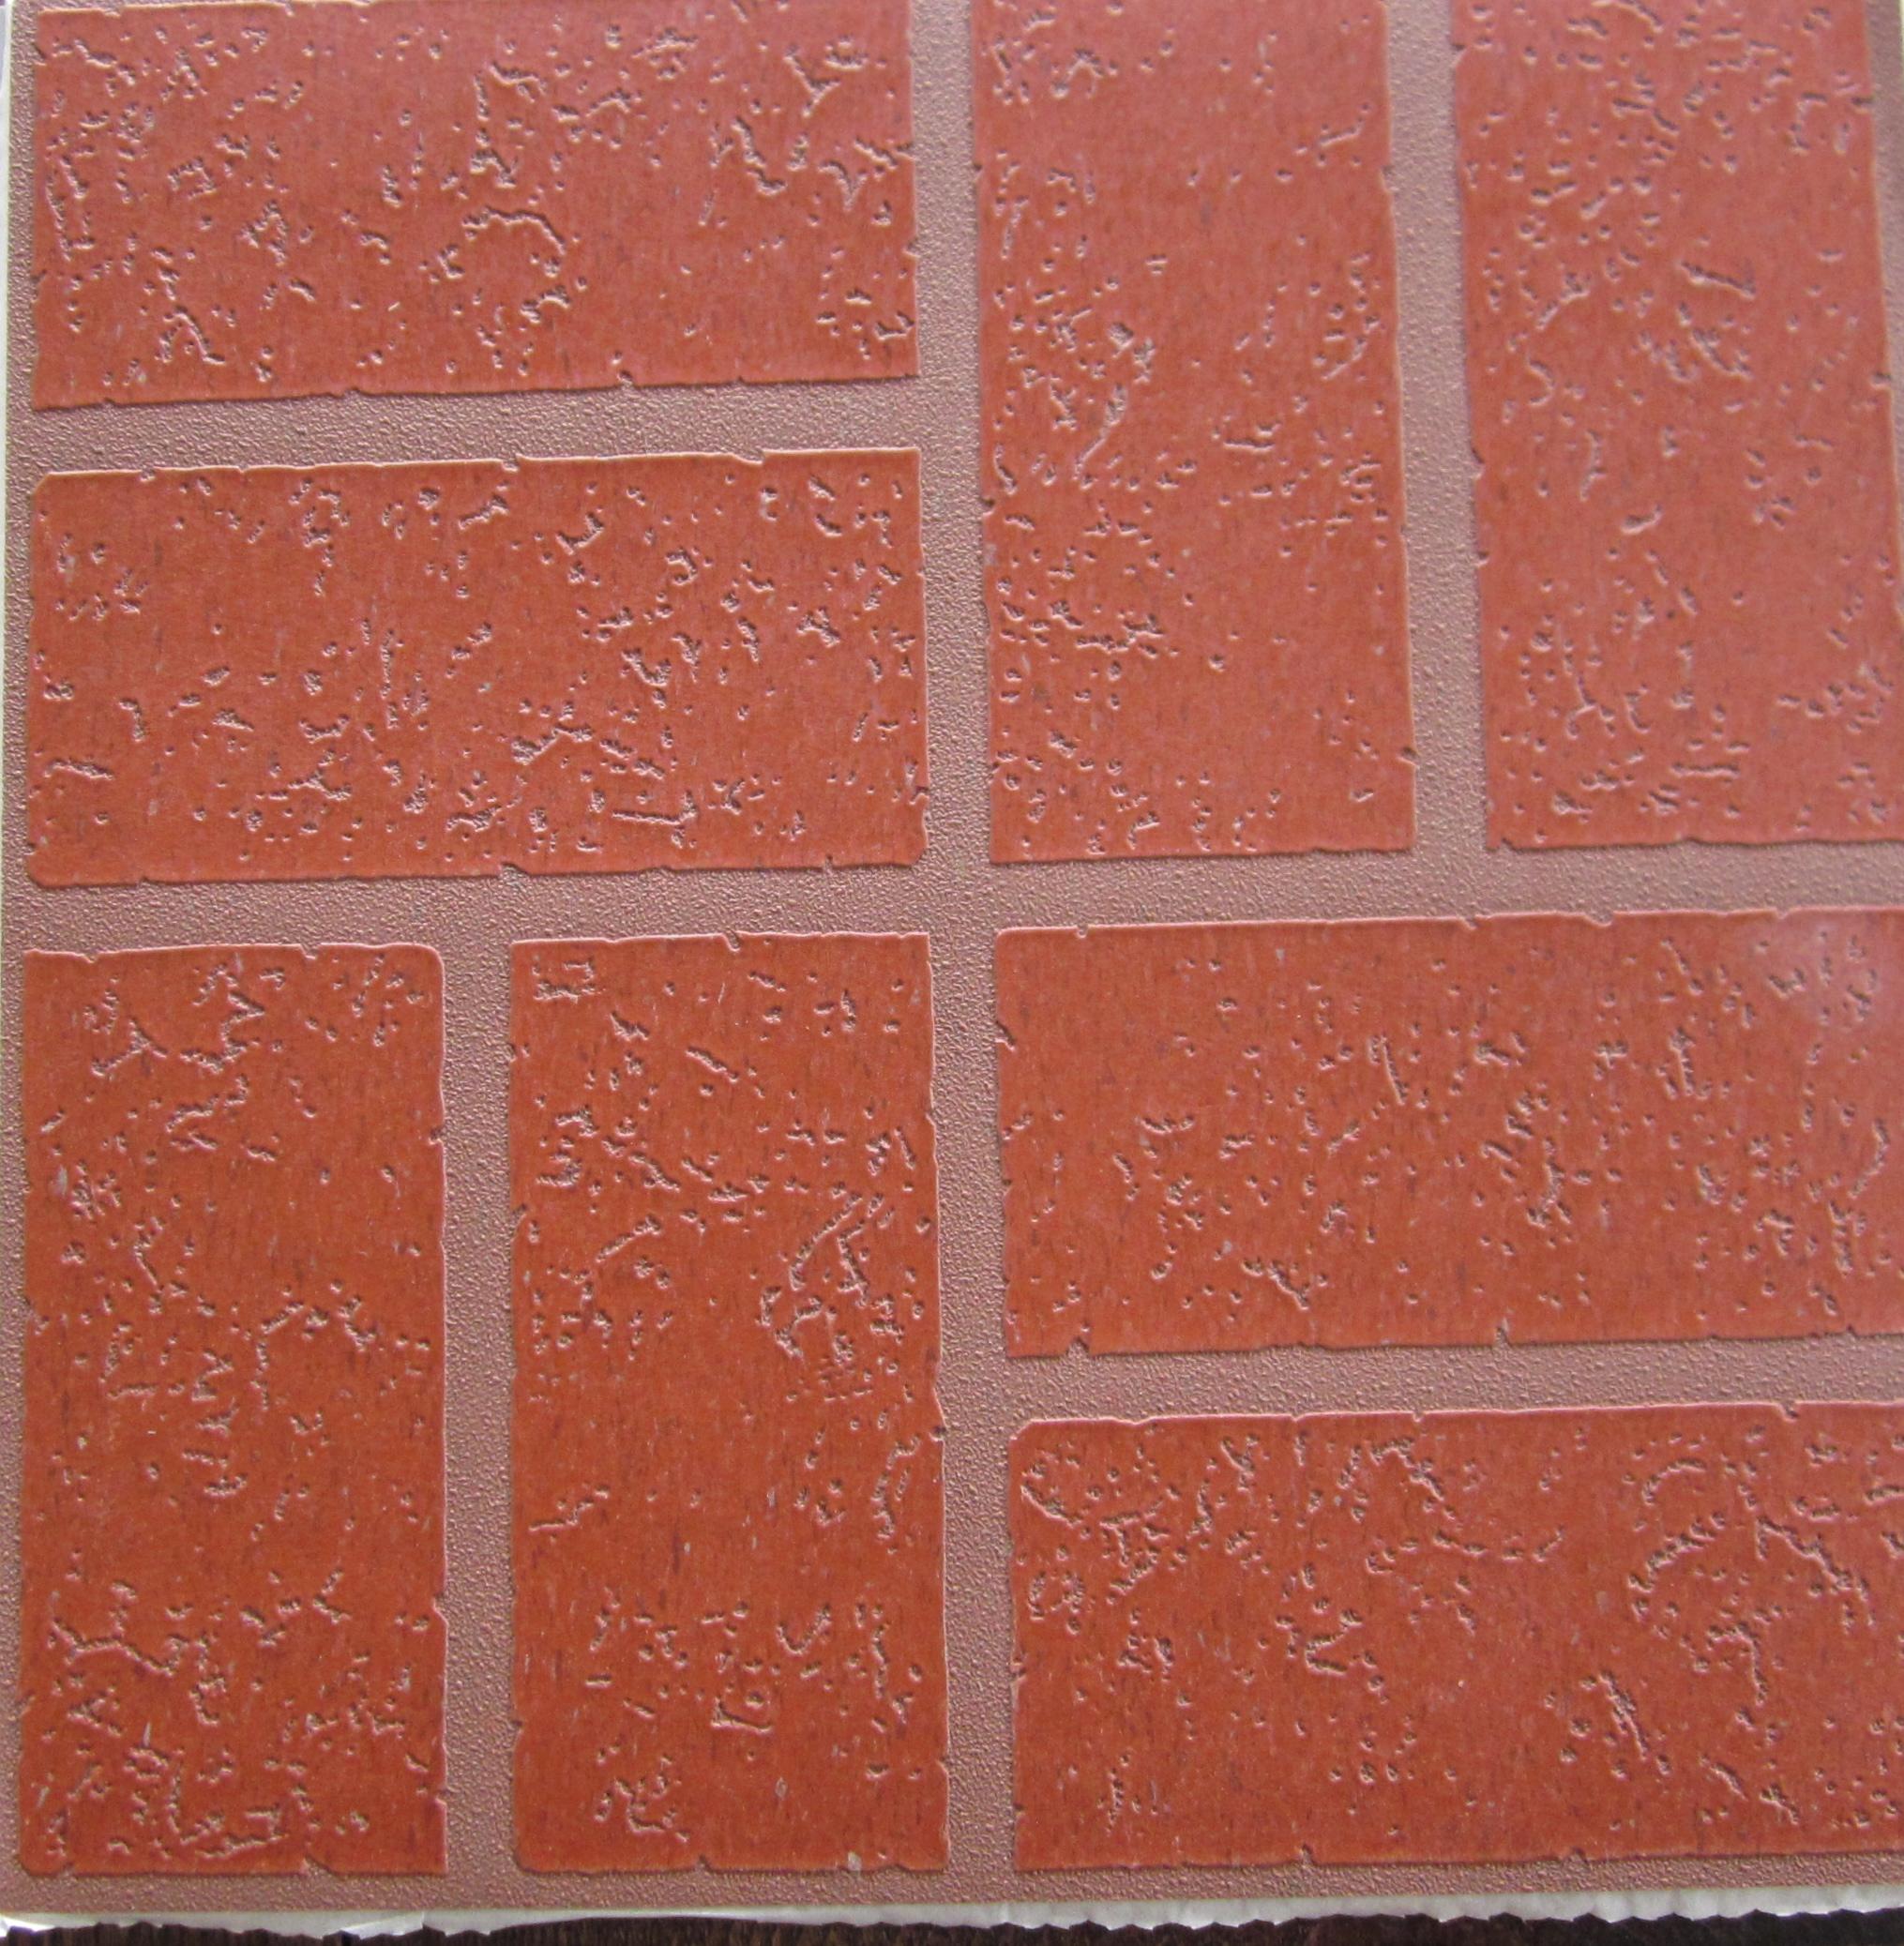 A brick in time smallhousepress for Vinyl floor tiles